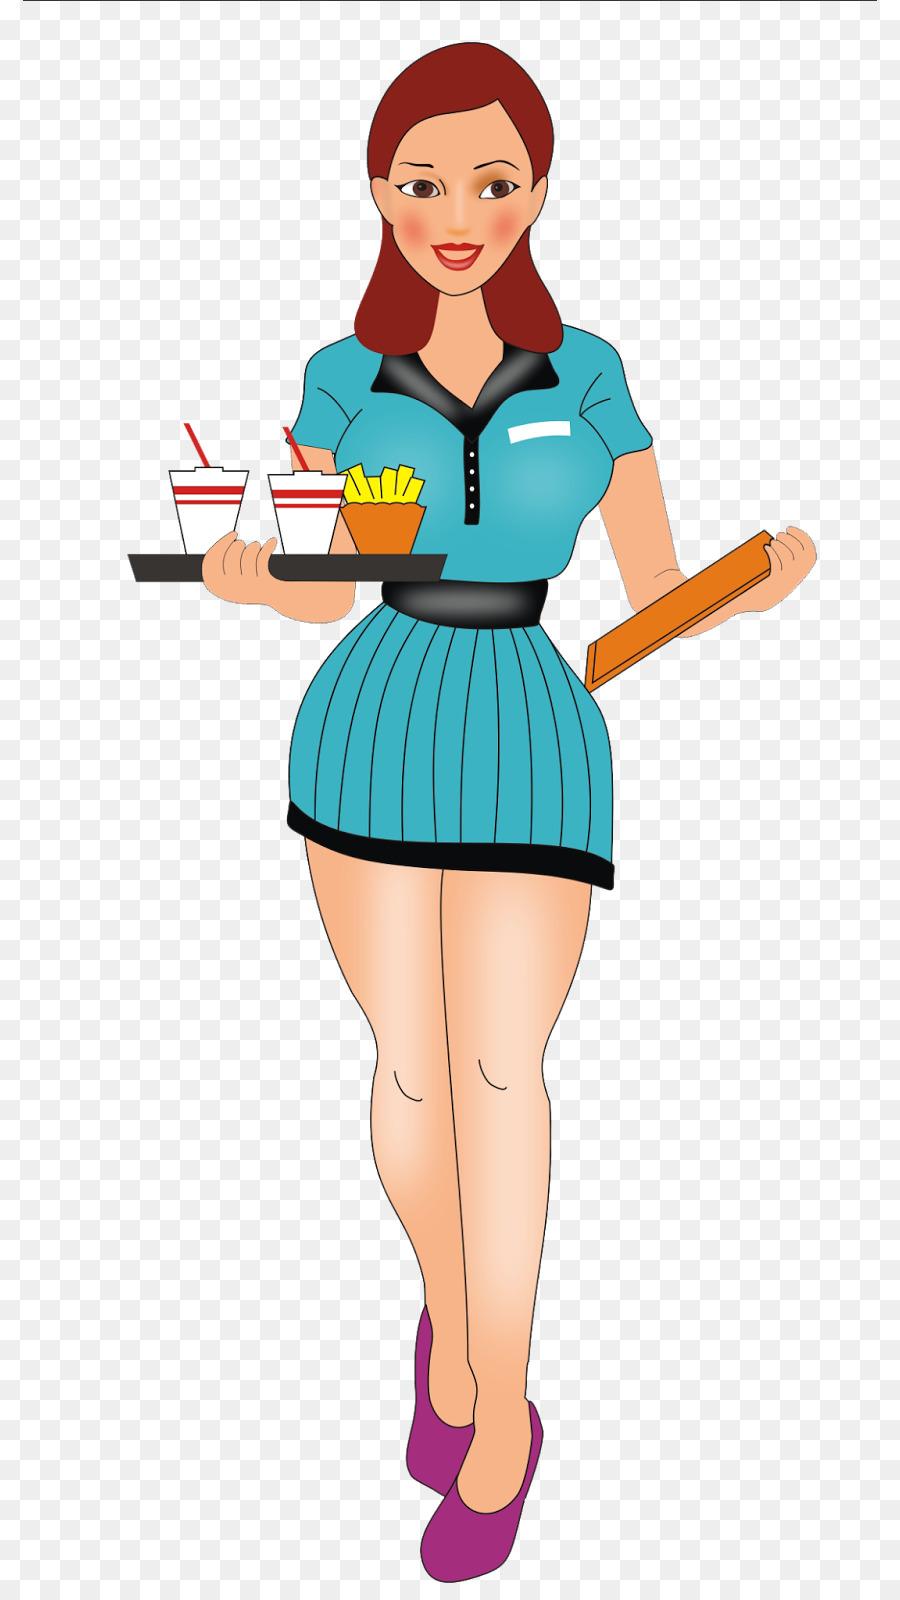 Cartoon waitress clipart graphic free Cartoon Cartoon clipart - Clothing, transparent clip art graphic free